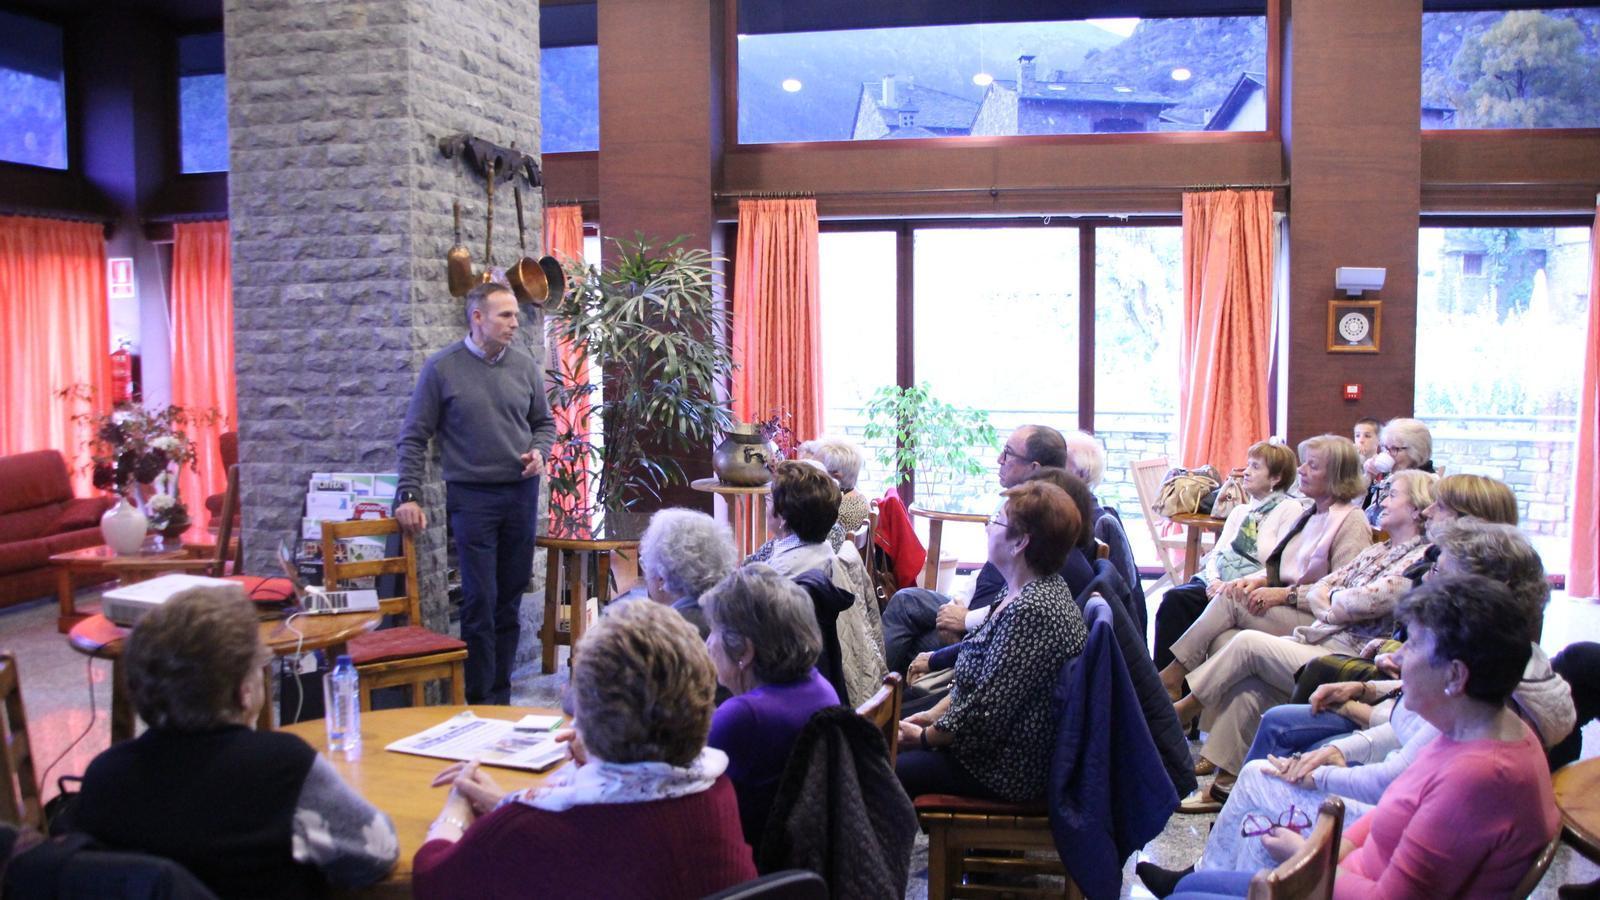 Santiago Raggio explica com prevenir lesions a la gent gran d'Ordino. / A.S.